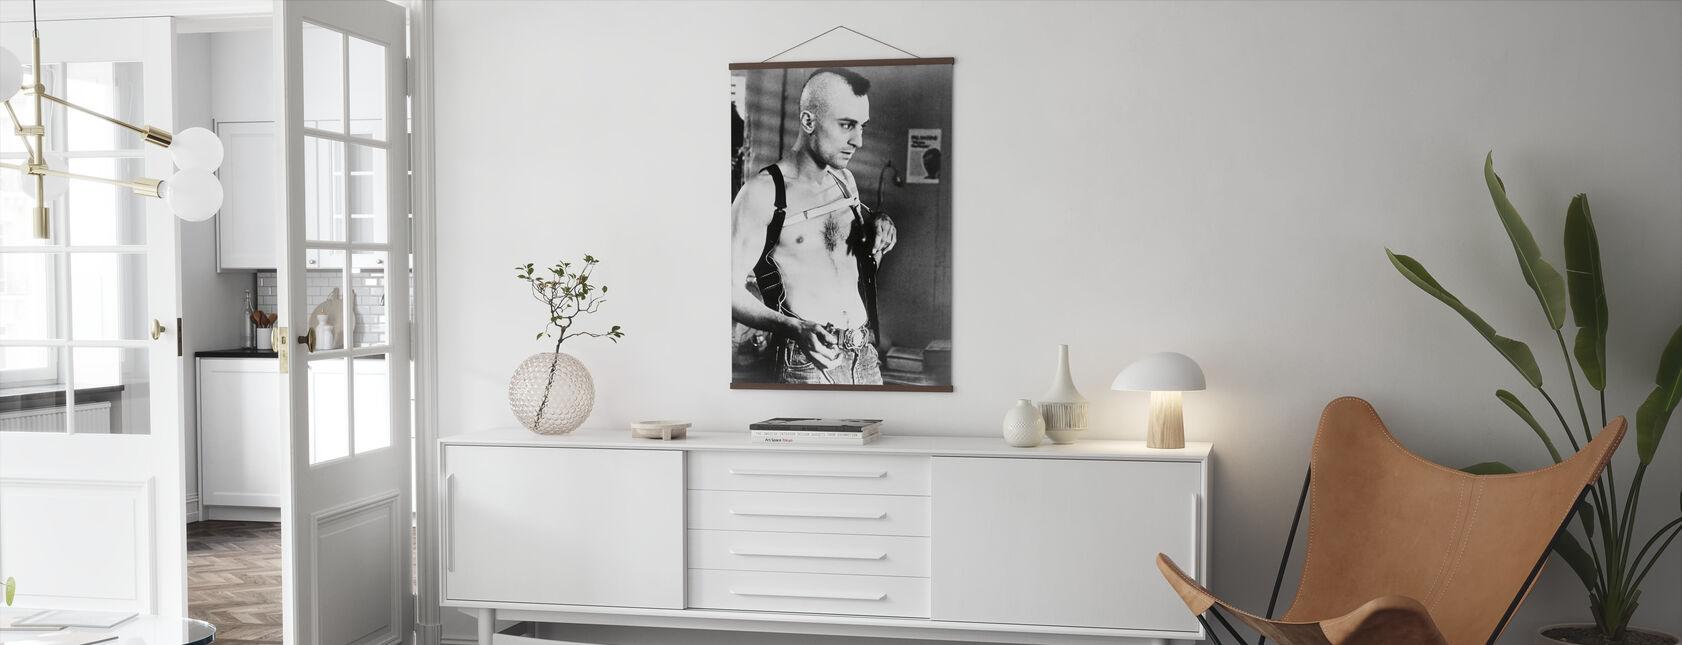 Robert de Niro in Taxi Driver - Poster - Living Room